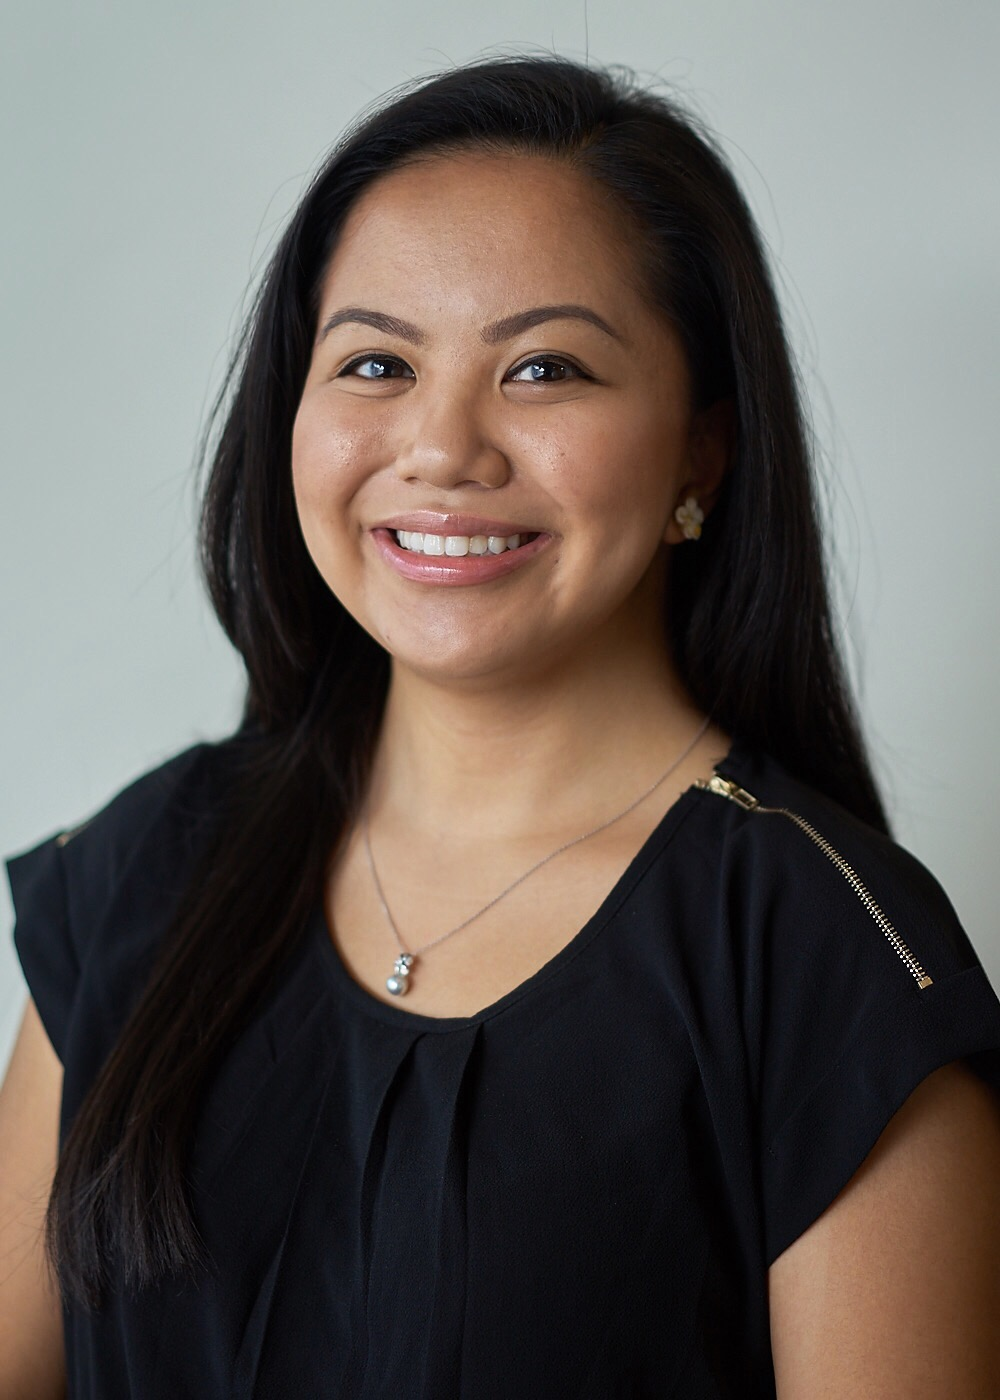 Meet Alyssa, a patient coordinator assistant at Tanega Dental in South San Francisco.